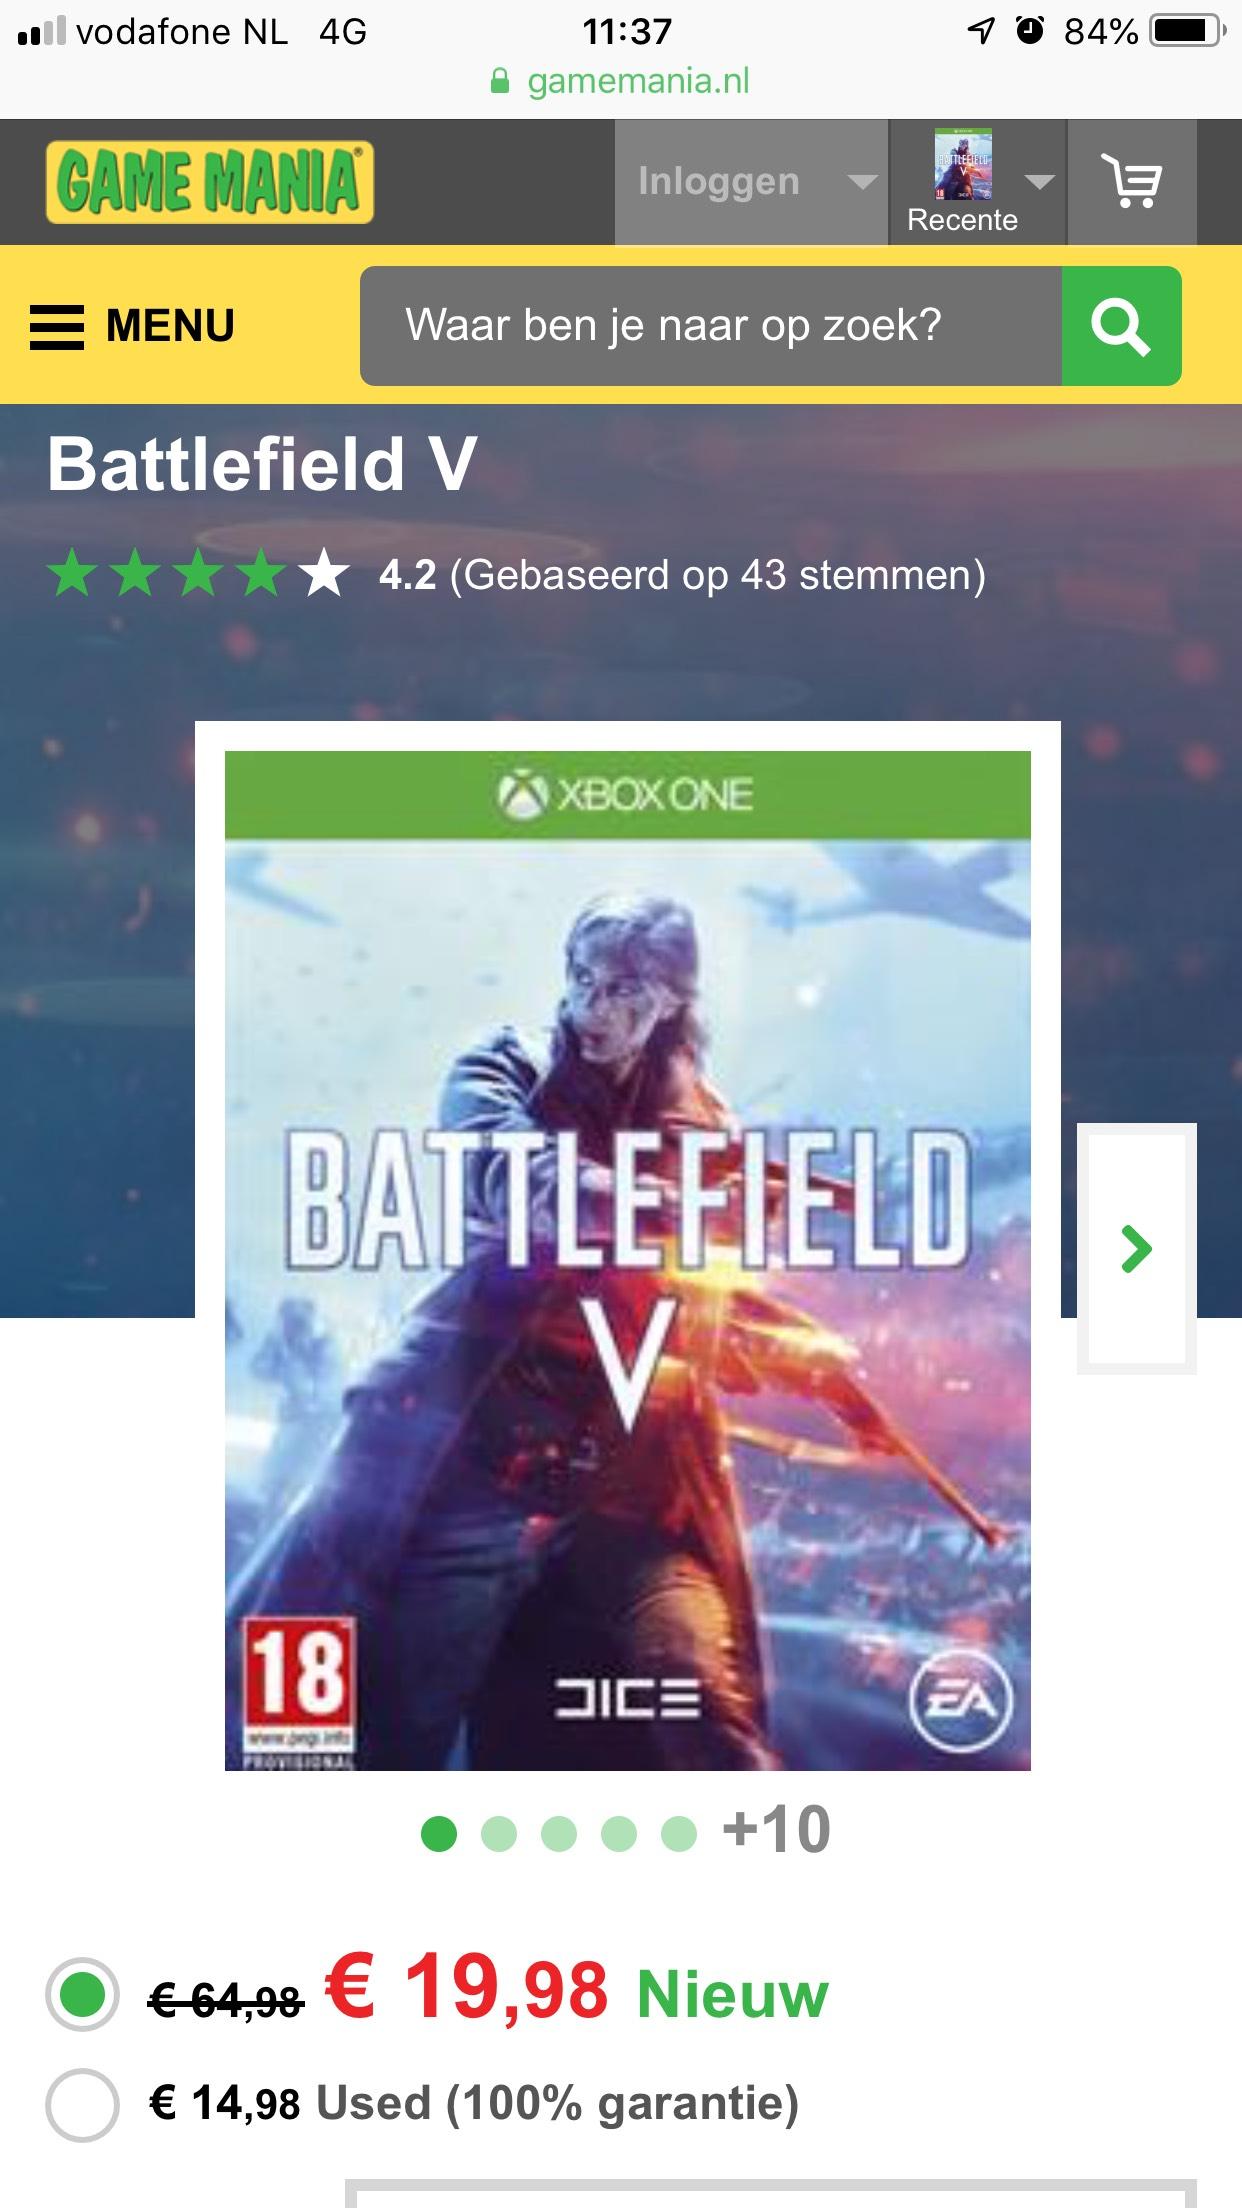 Battlefield V 20 euro bij Game Mania